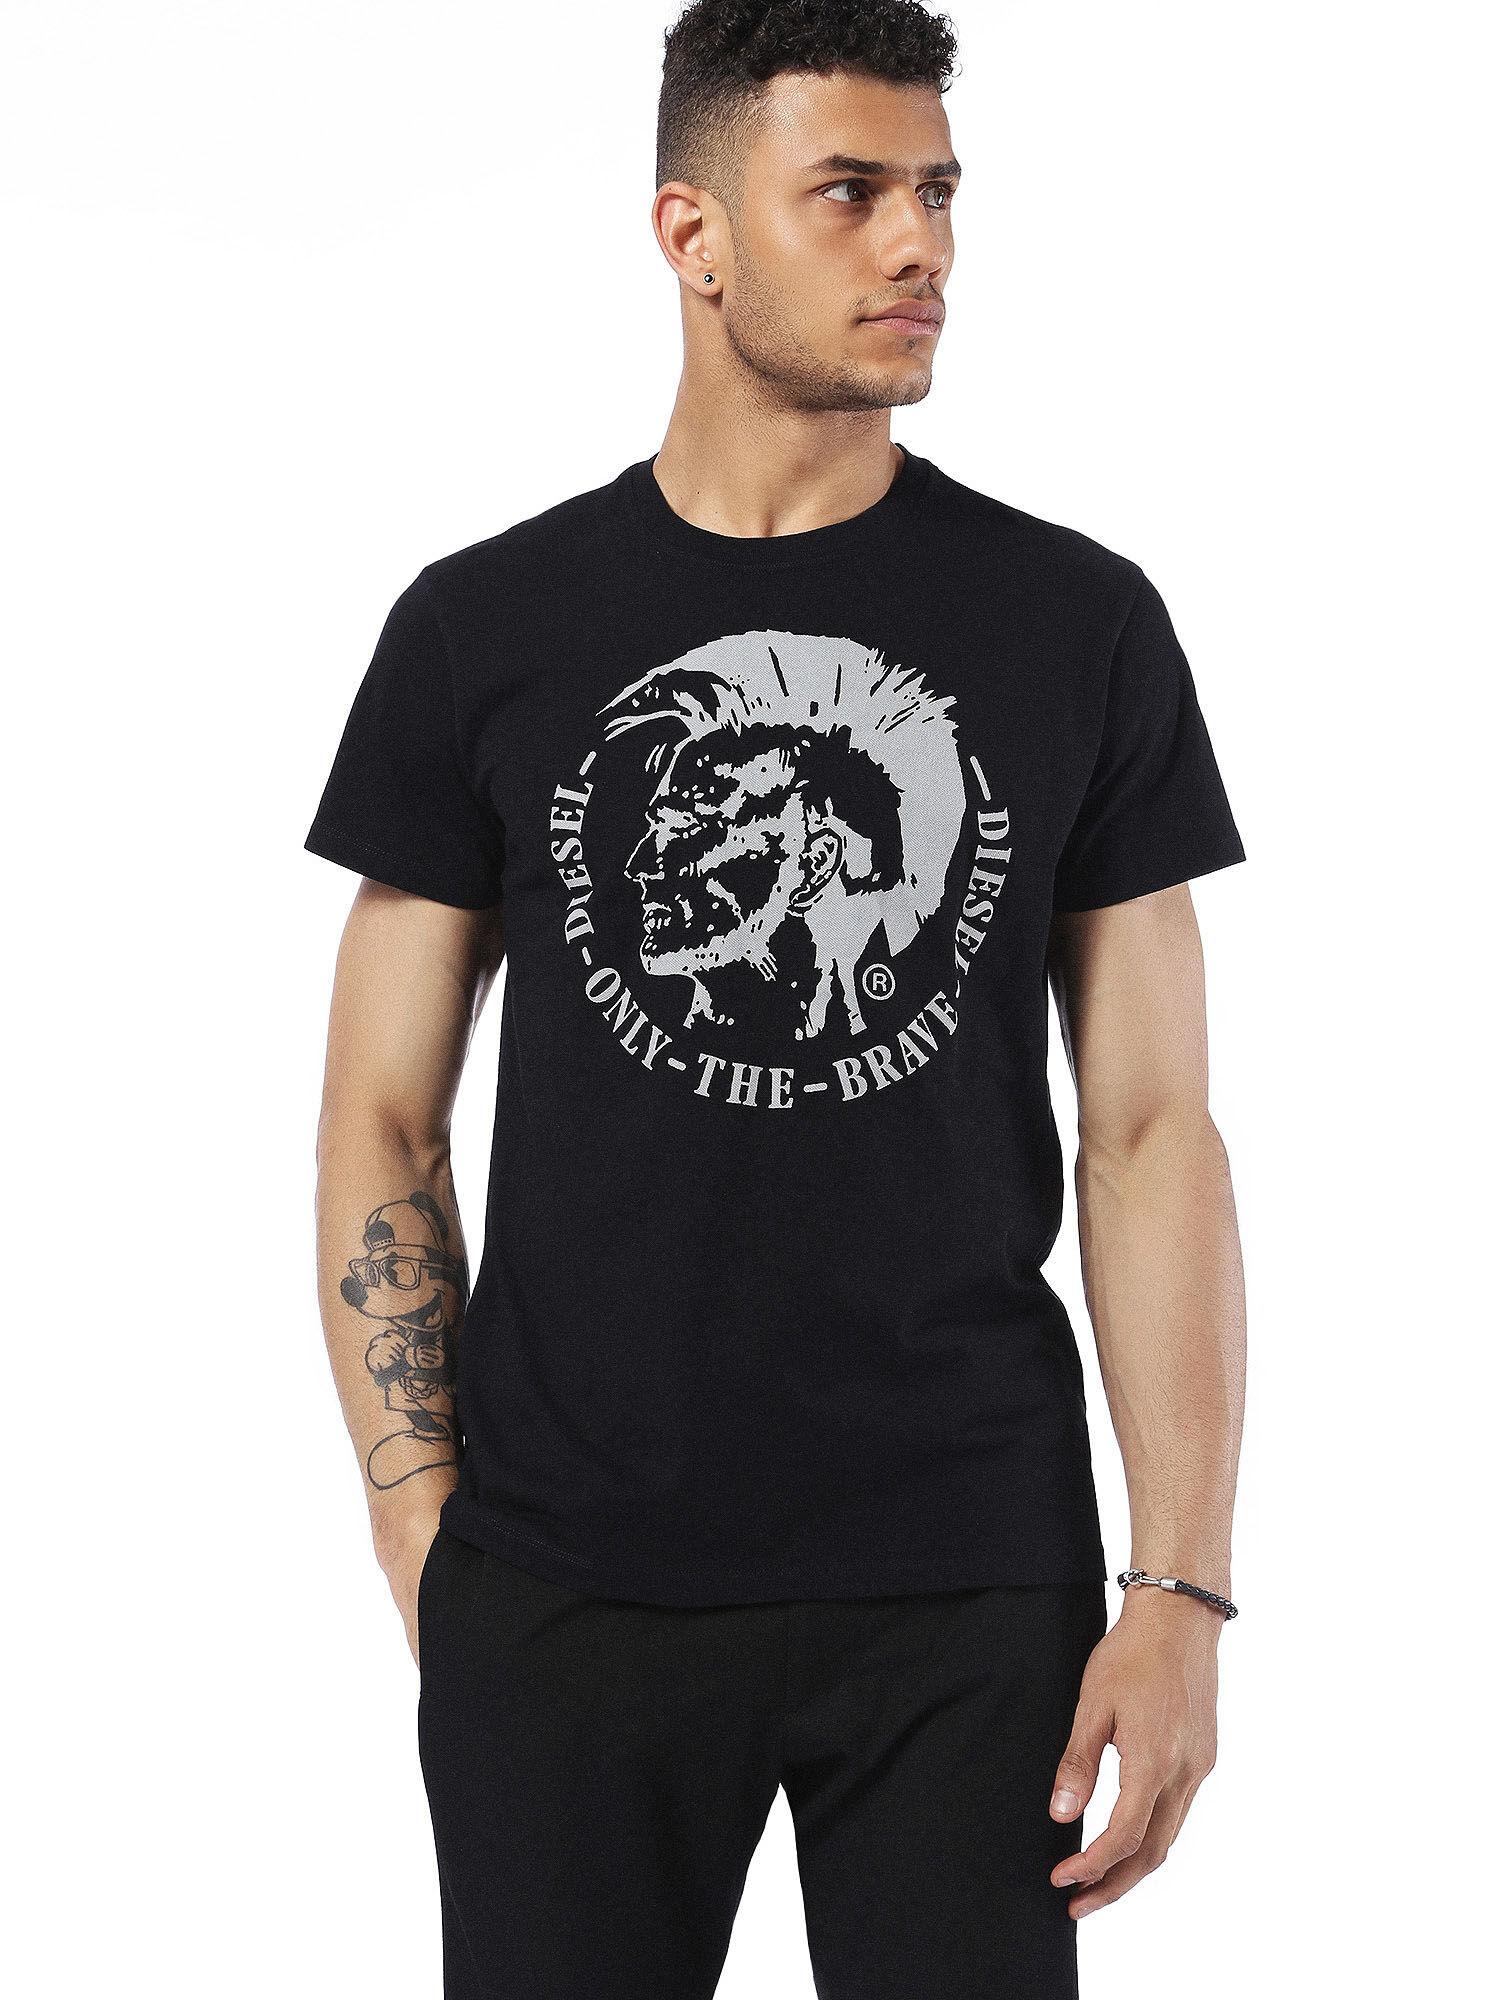 00SQXC0091B T-Shirts Man T-DIEGO-FO by Diesel Black